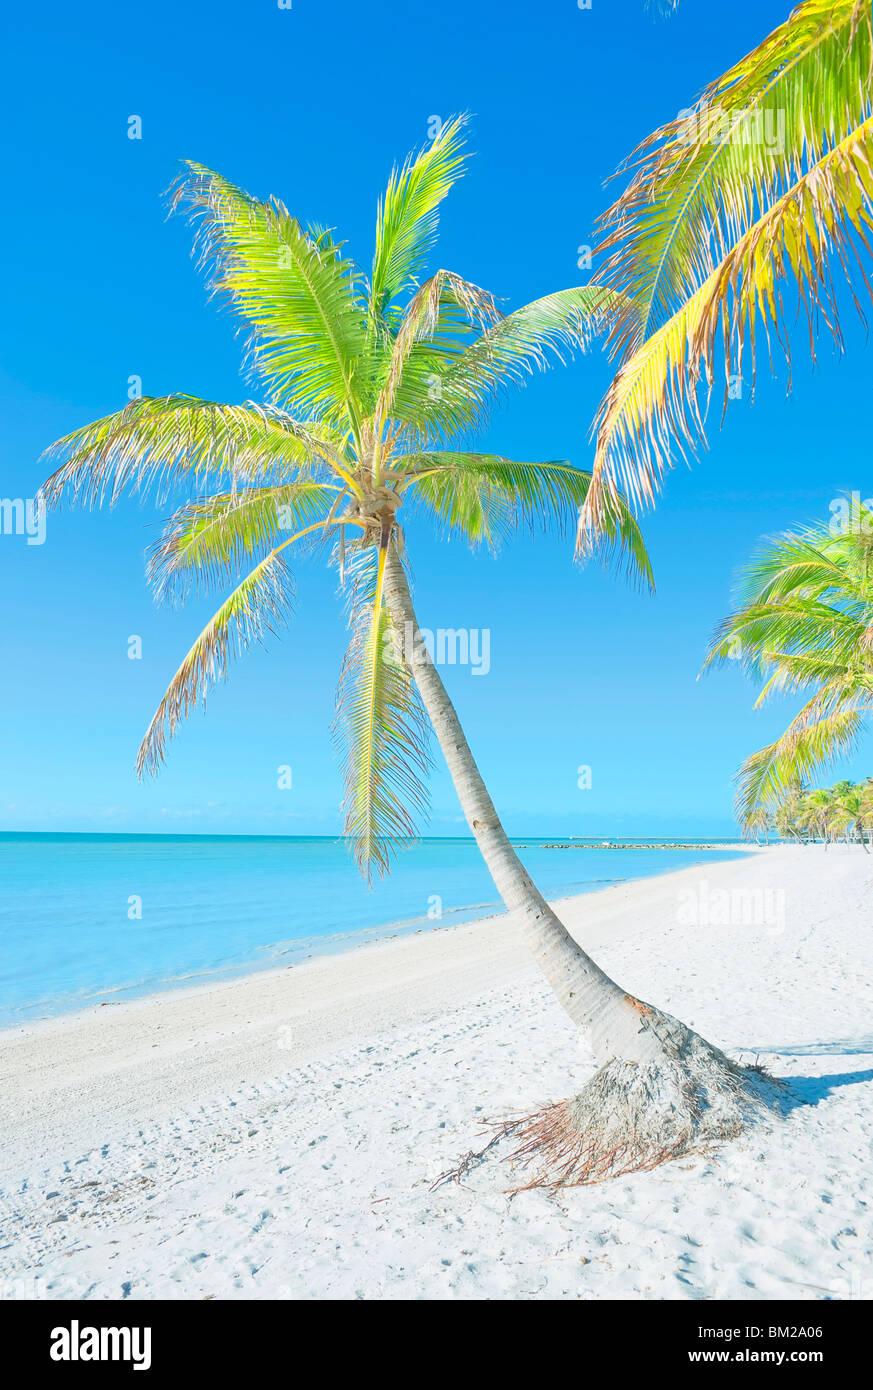 Palm trees on George Smathers Beach, Key West, Florida, USA - Stock Image